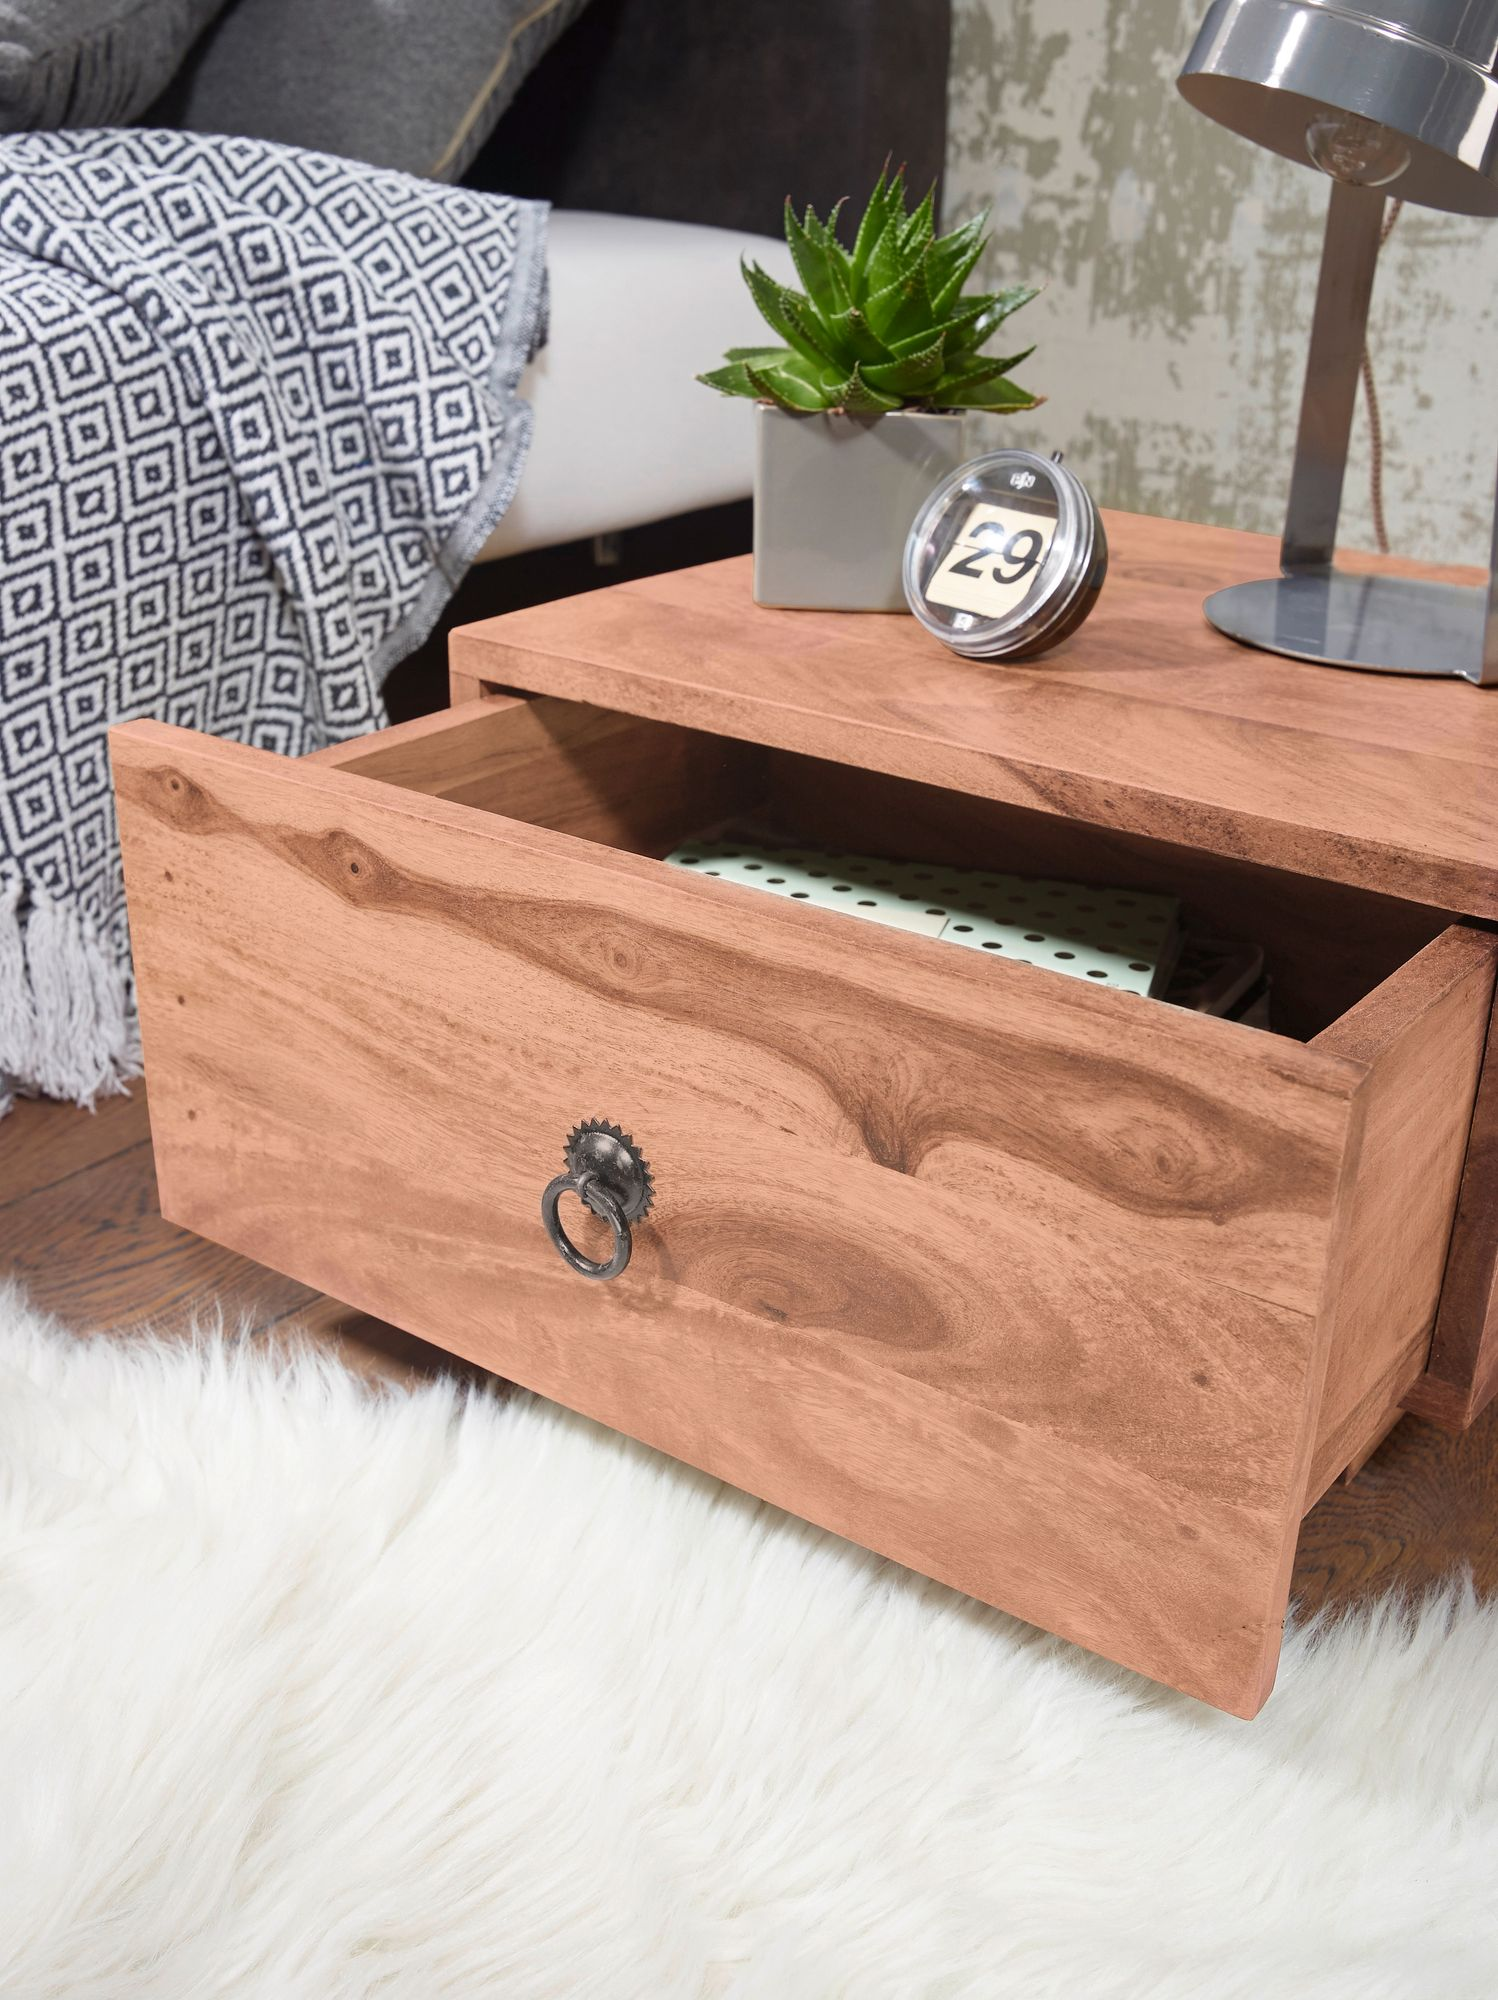 Finebuy Nachttisch Massiv Holz Nacht Kommode 25 Cm Hoch Schublade Nachtschrank